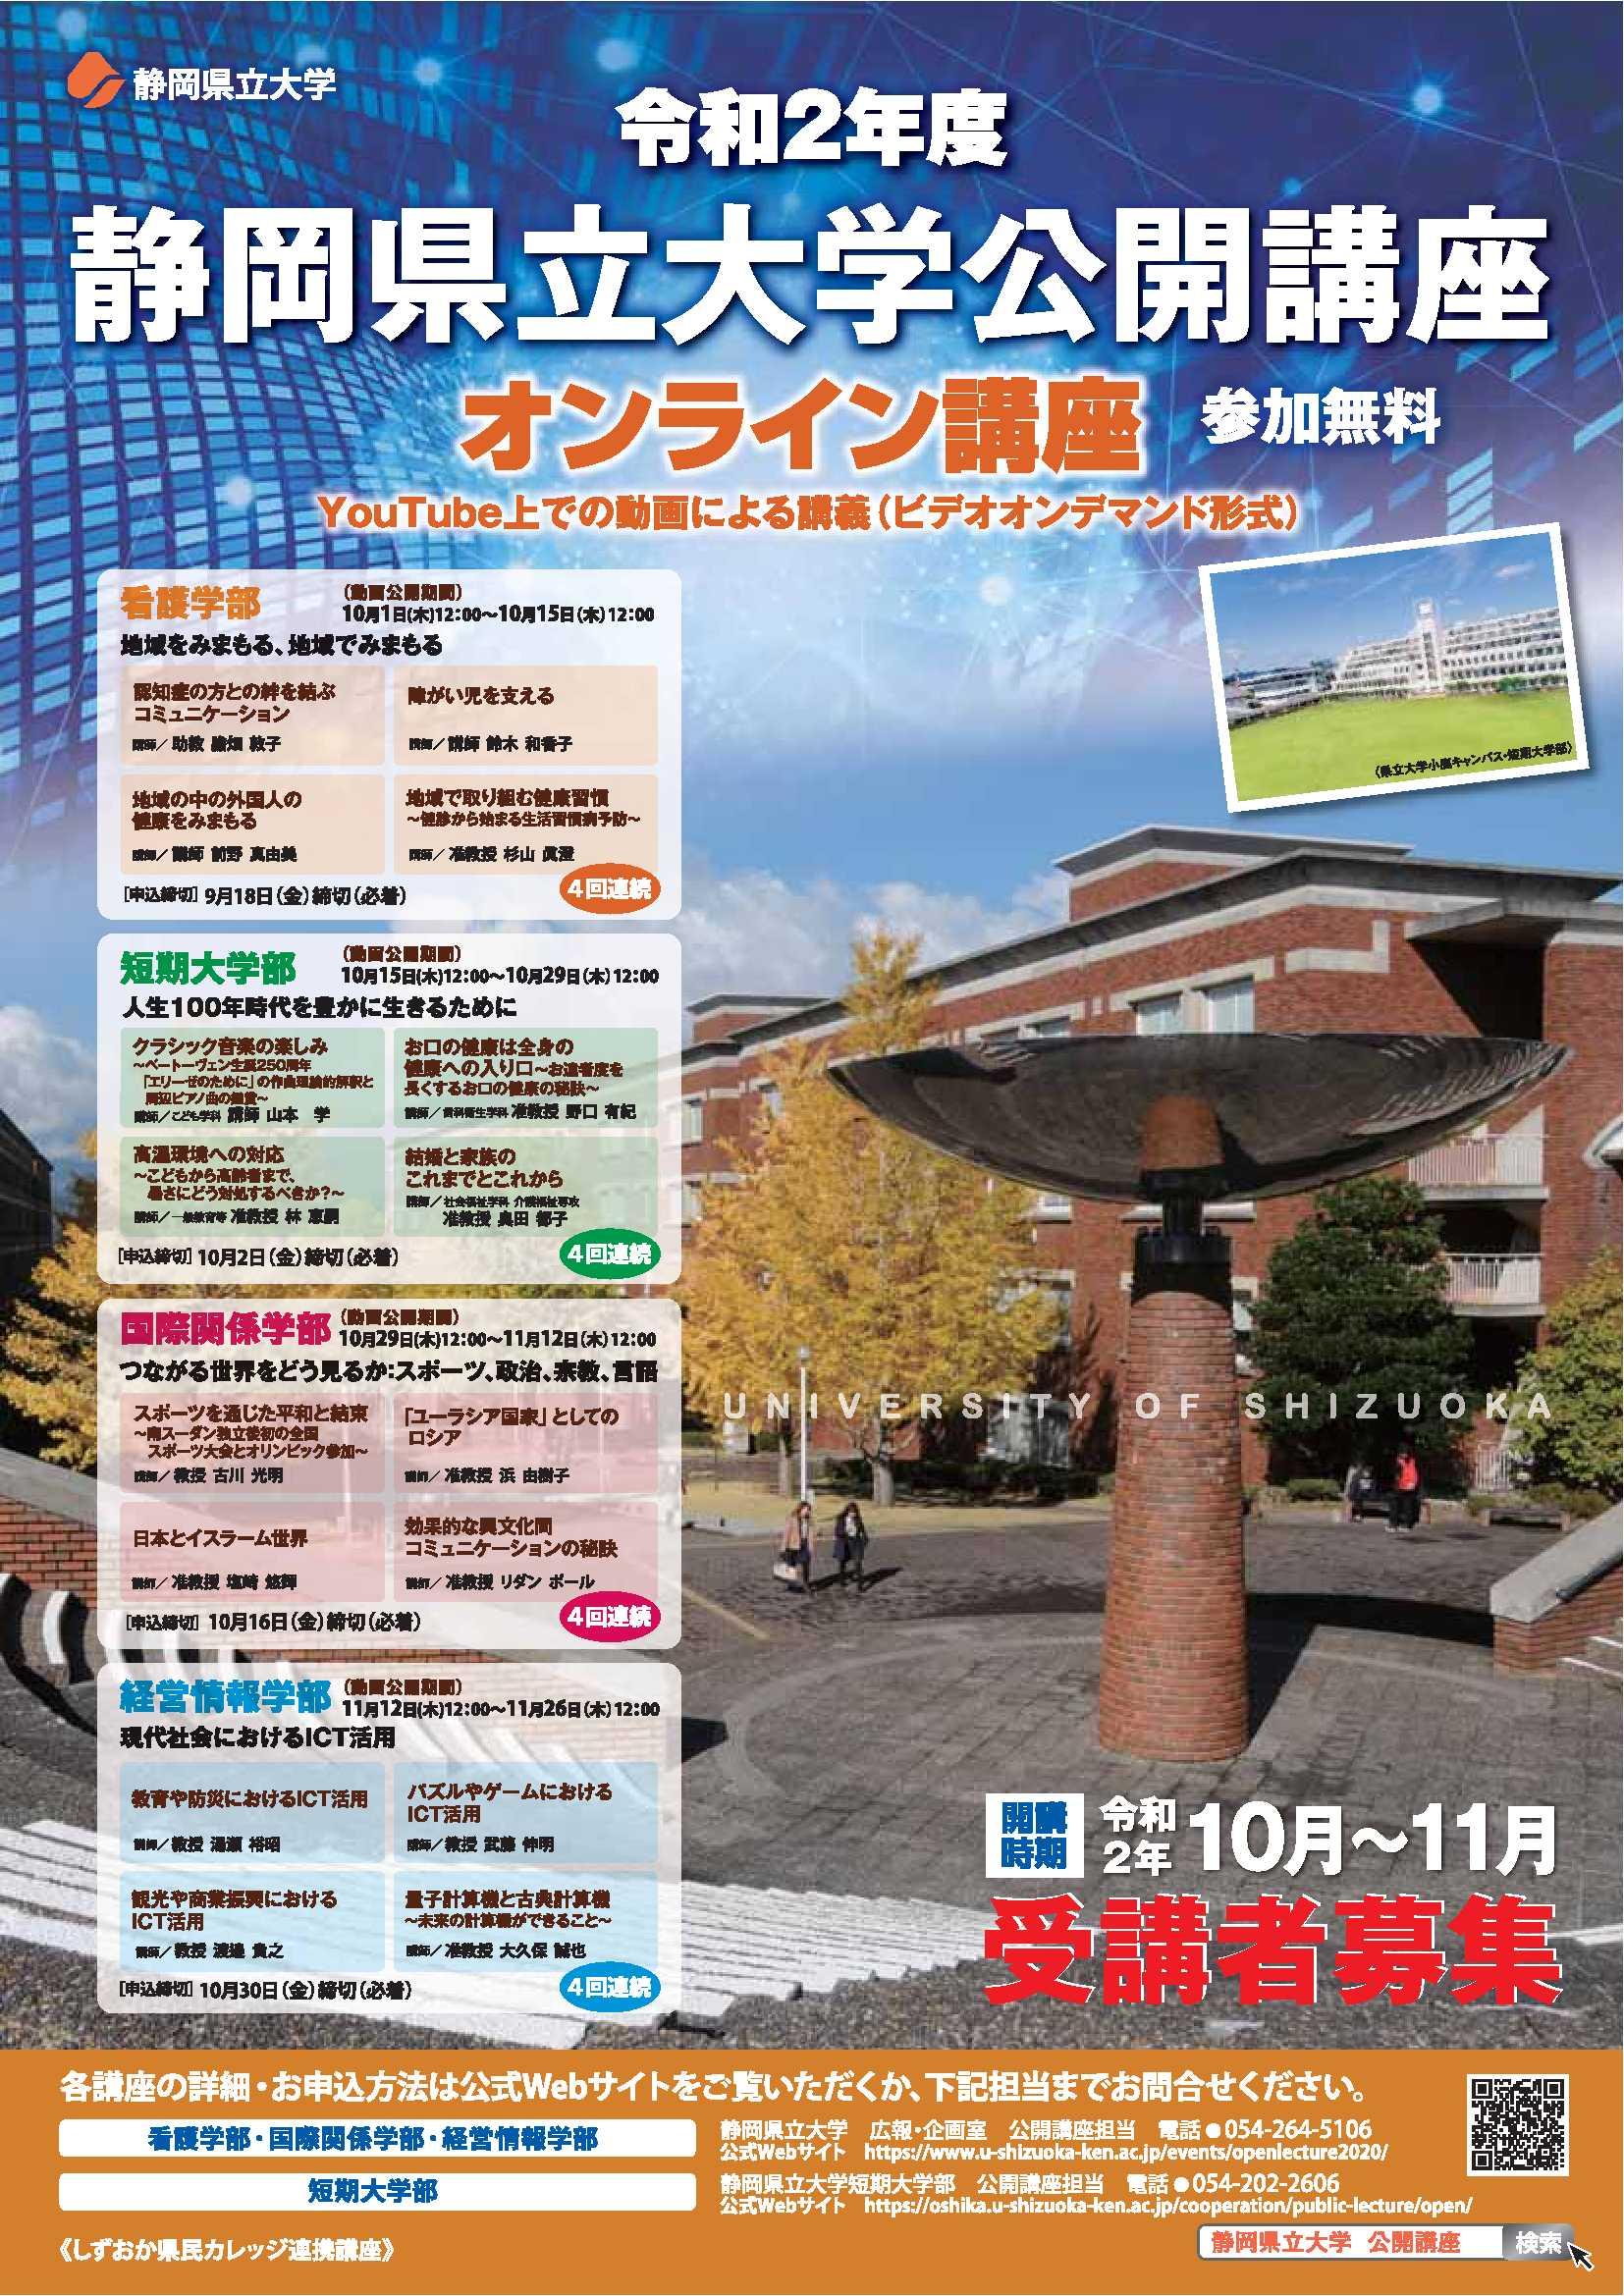 令和2年度県立大学公開講座ポスター